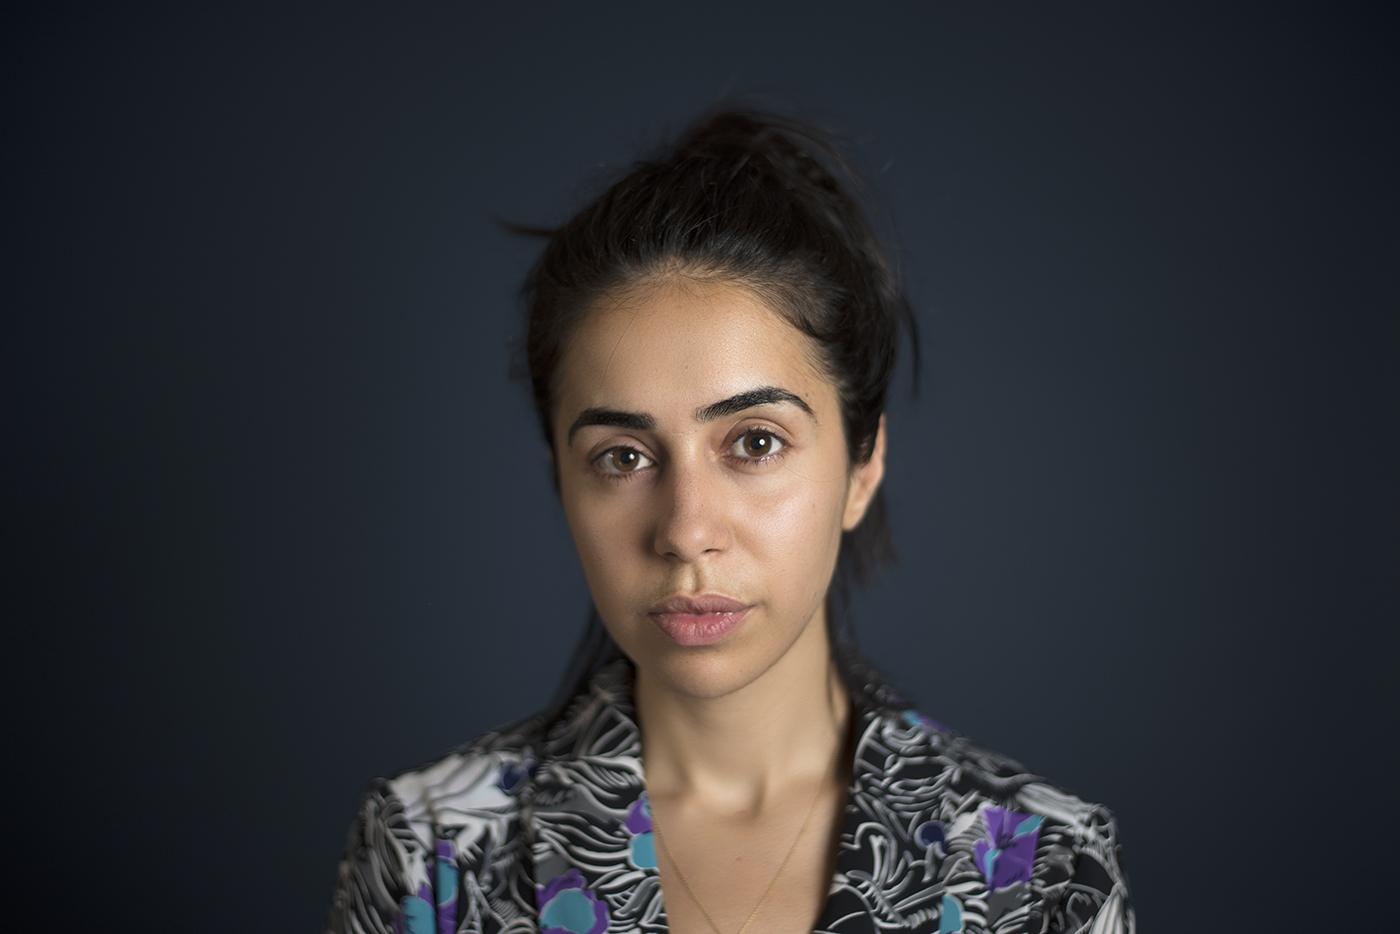 Myriam Ben Salah. Courtesy Deborah Farnault